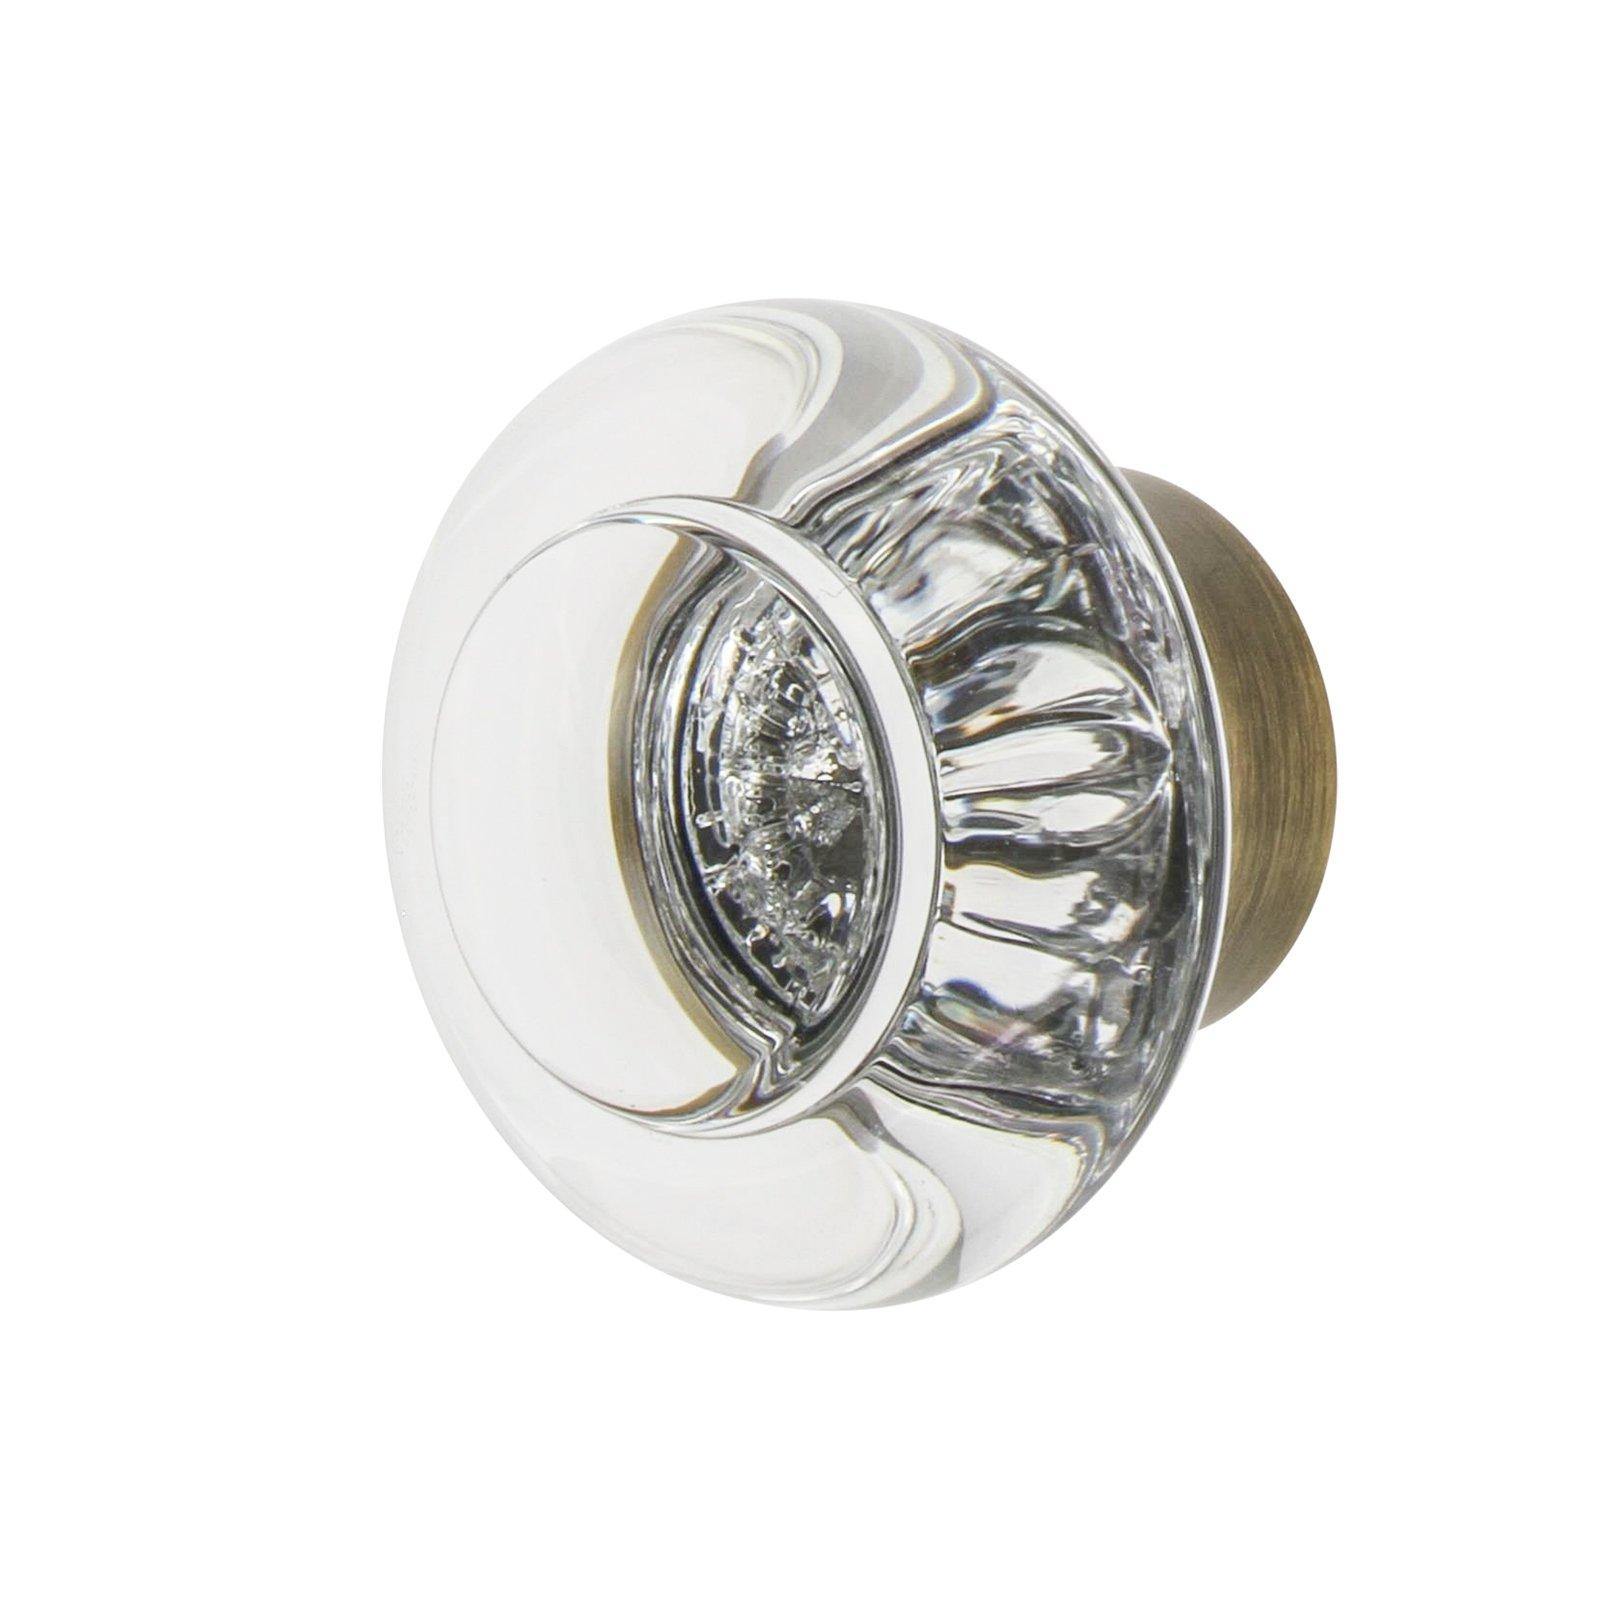 Nostalgic Warehouse 750001 Round Clear Crystal Cabinet Knob, 1-3/8'', Antique Brass